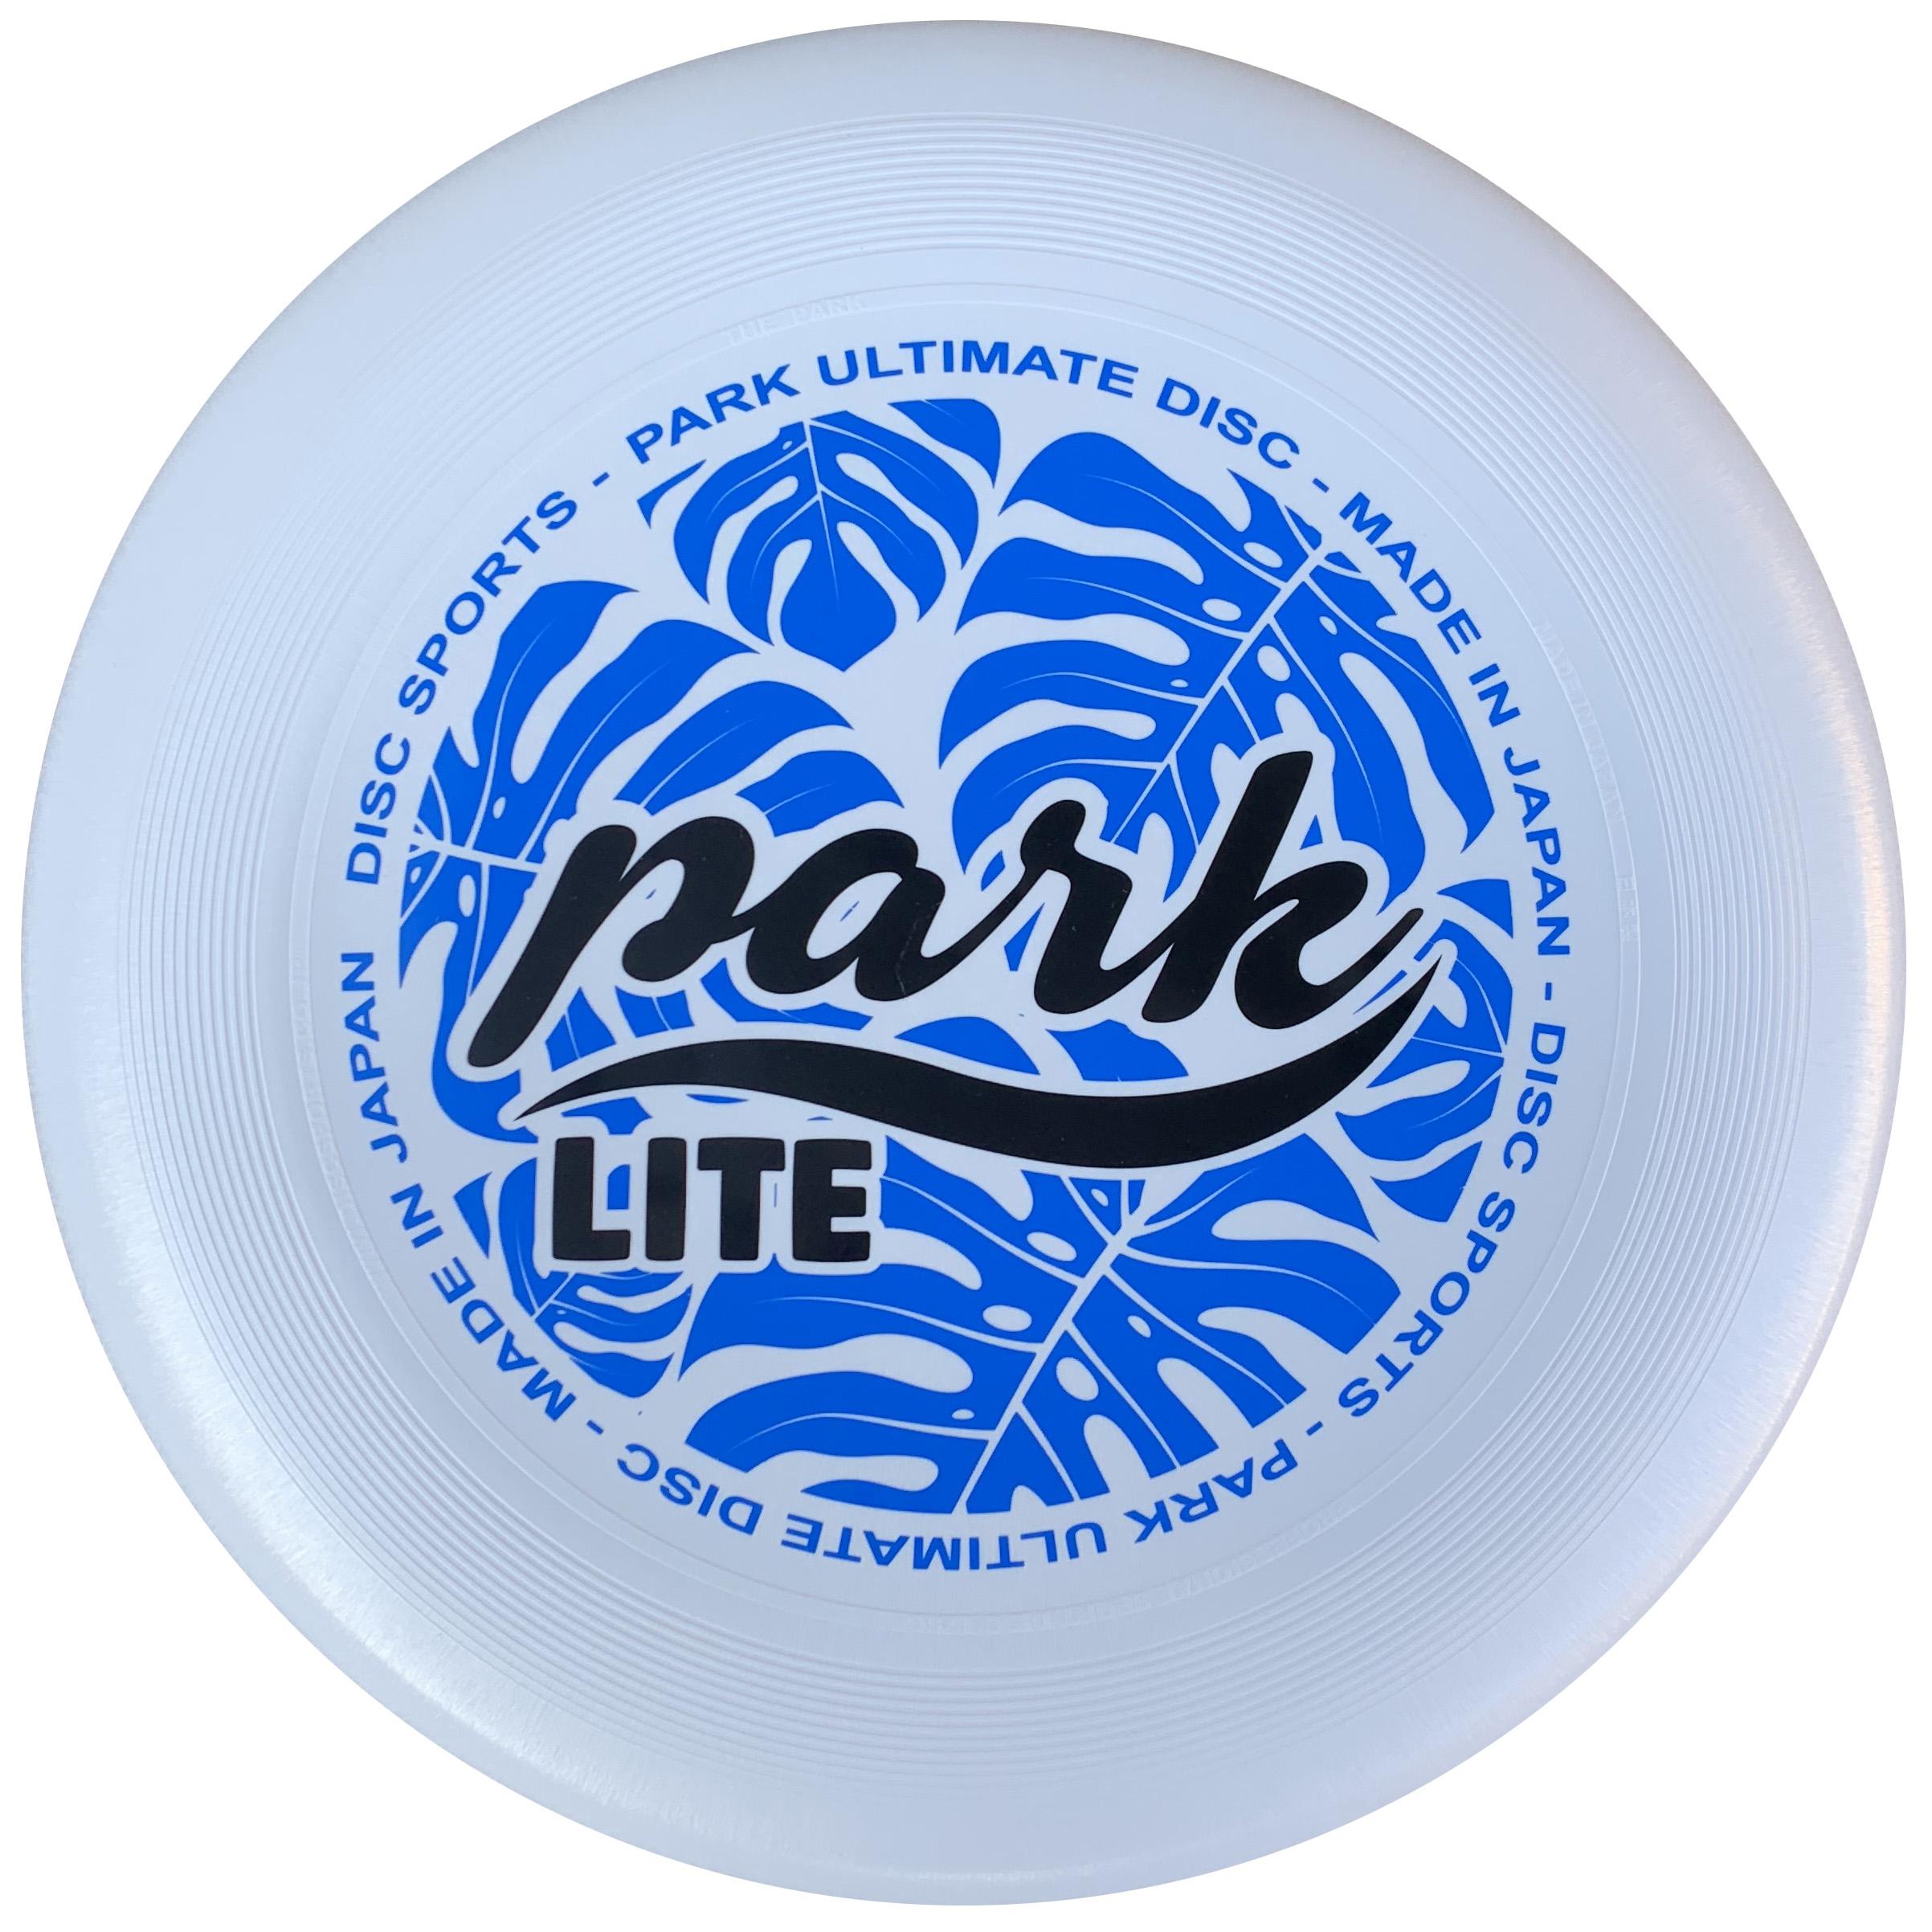 THE PARK LITE